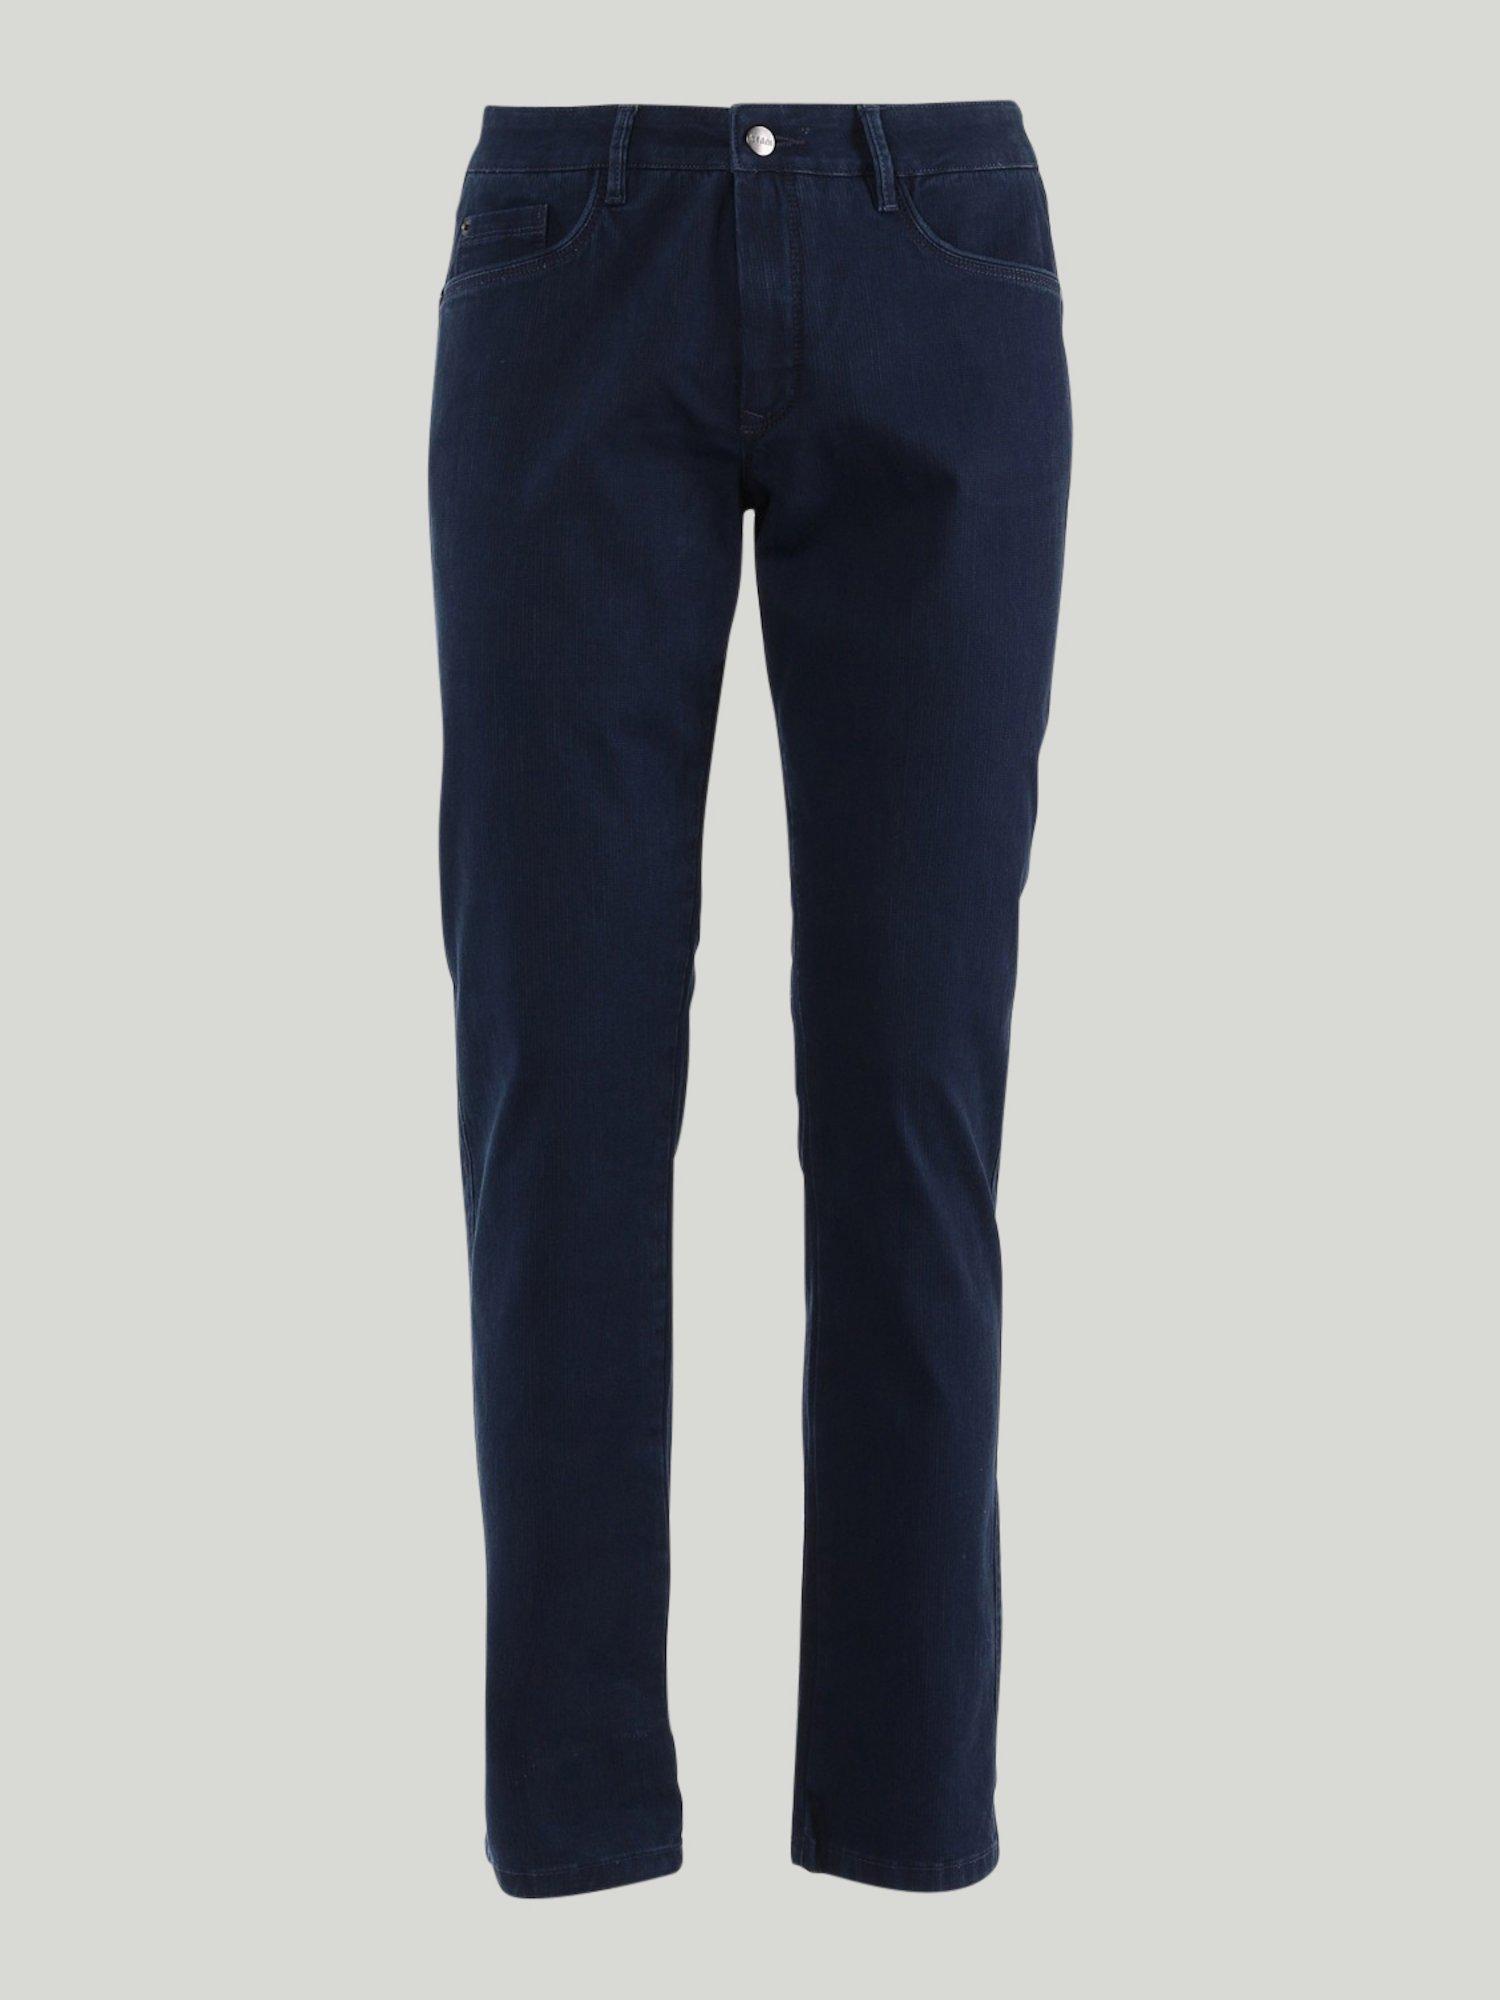 Eurimedonte pants  - Ocean Blue